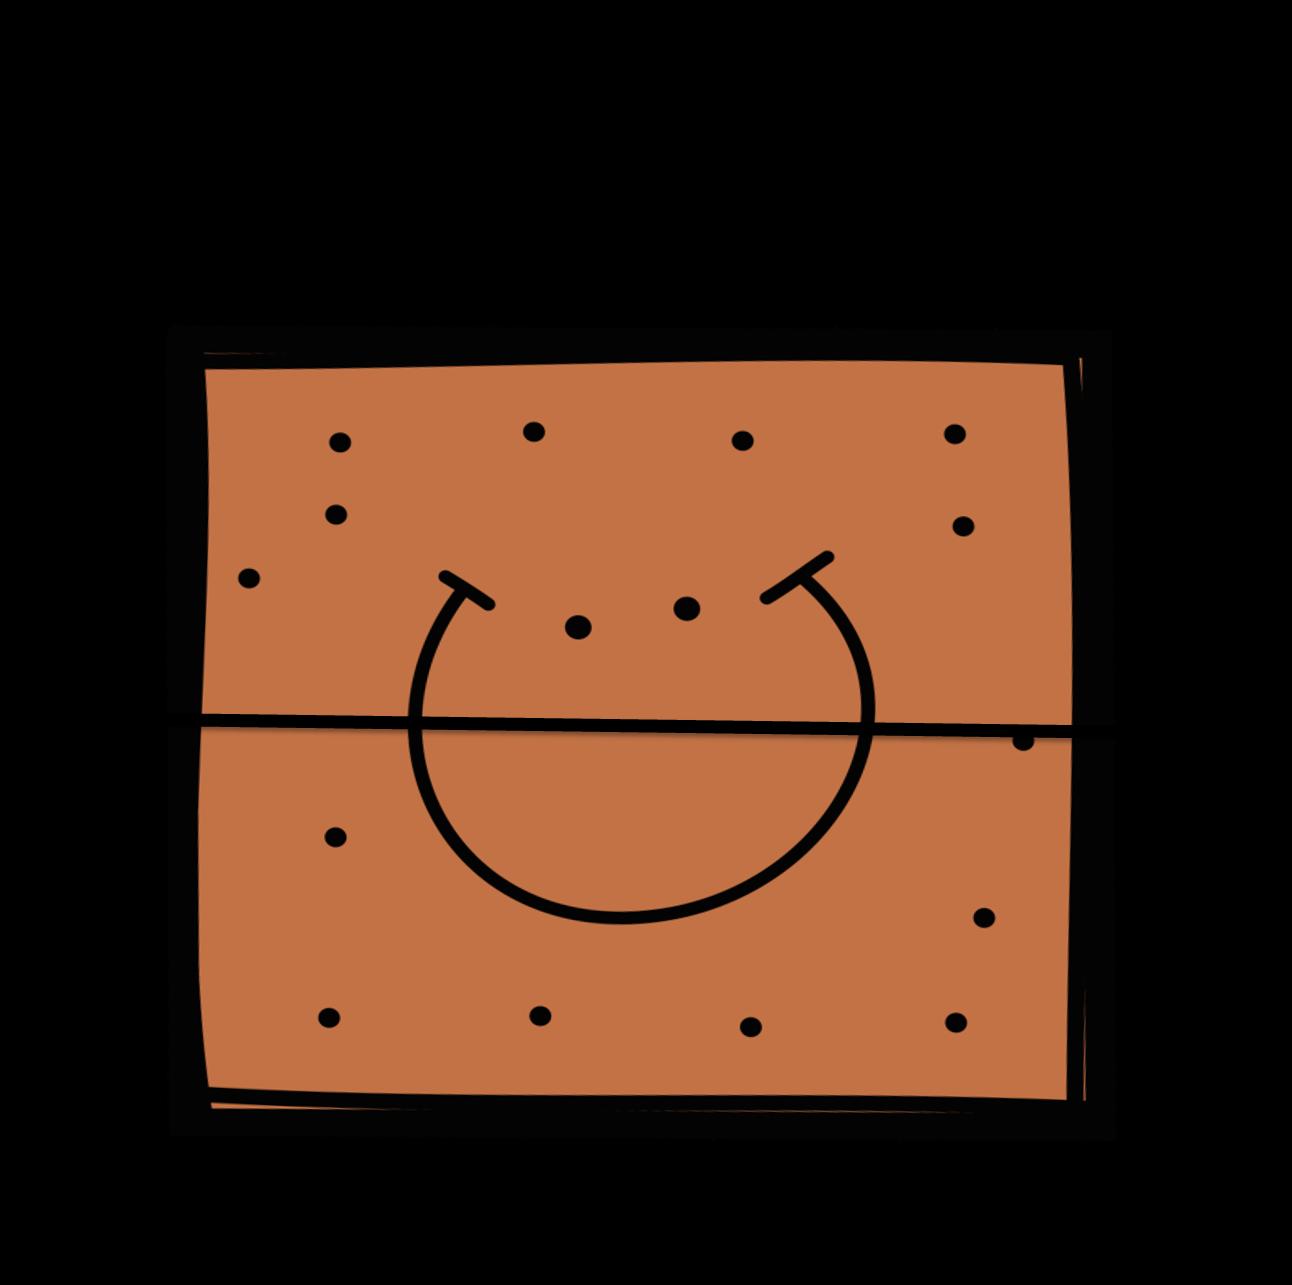 Fractions clipart rectangle fraction. Aaaaaachoo sneezy the snowman